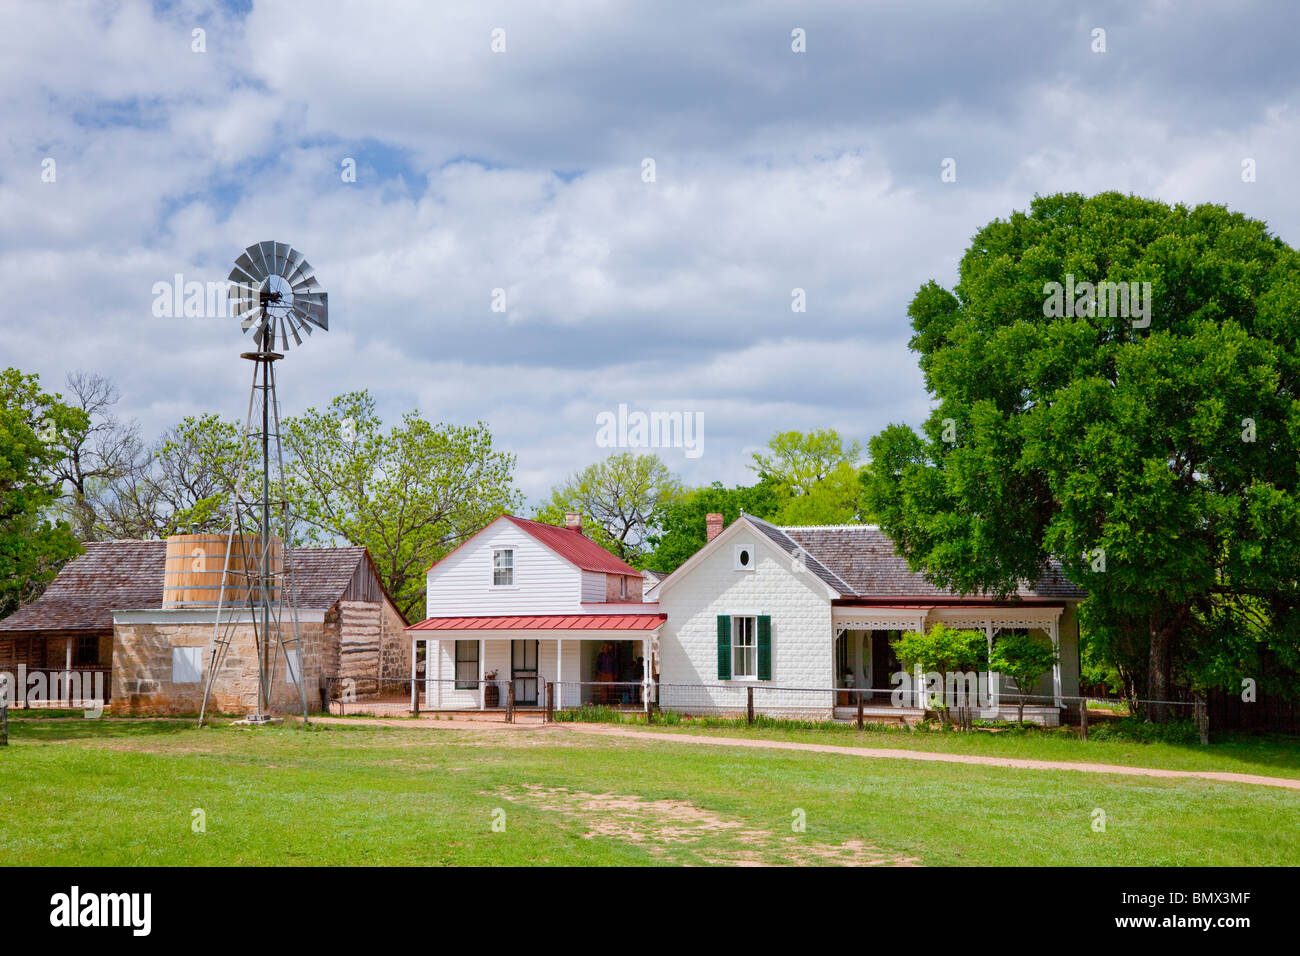 The Sauer-Beckmann Farmstead, near the Lyndon Bains Johnson National Historic Park visitors center. - Stock Image